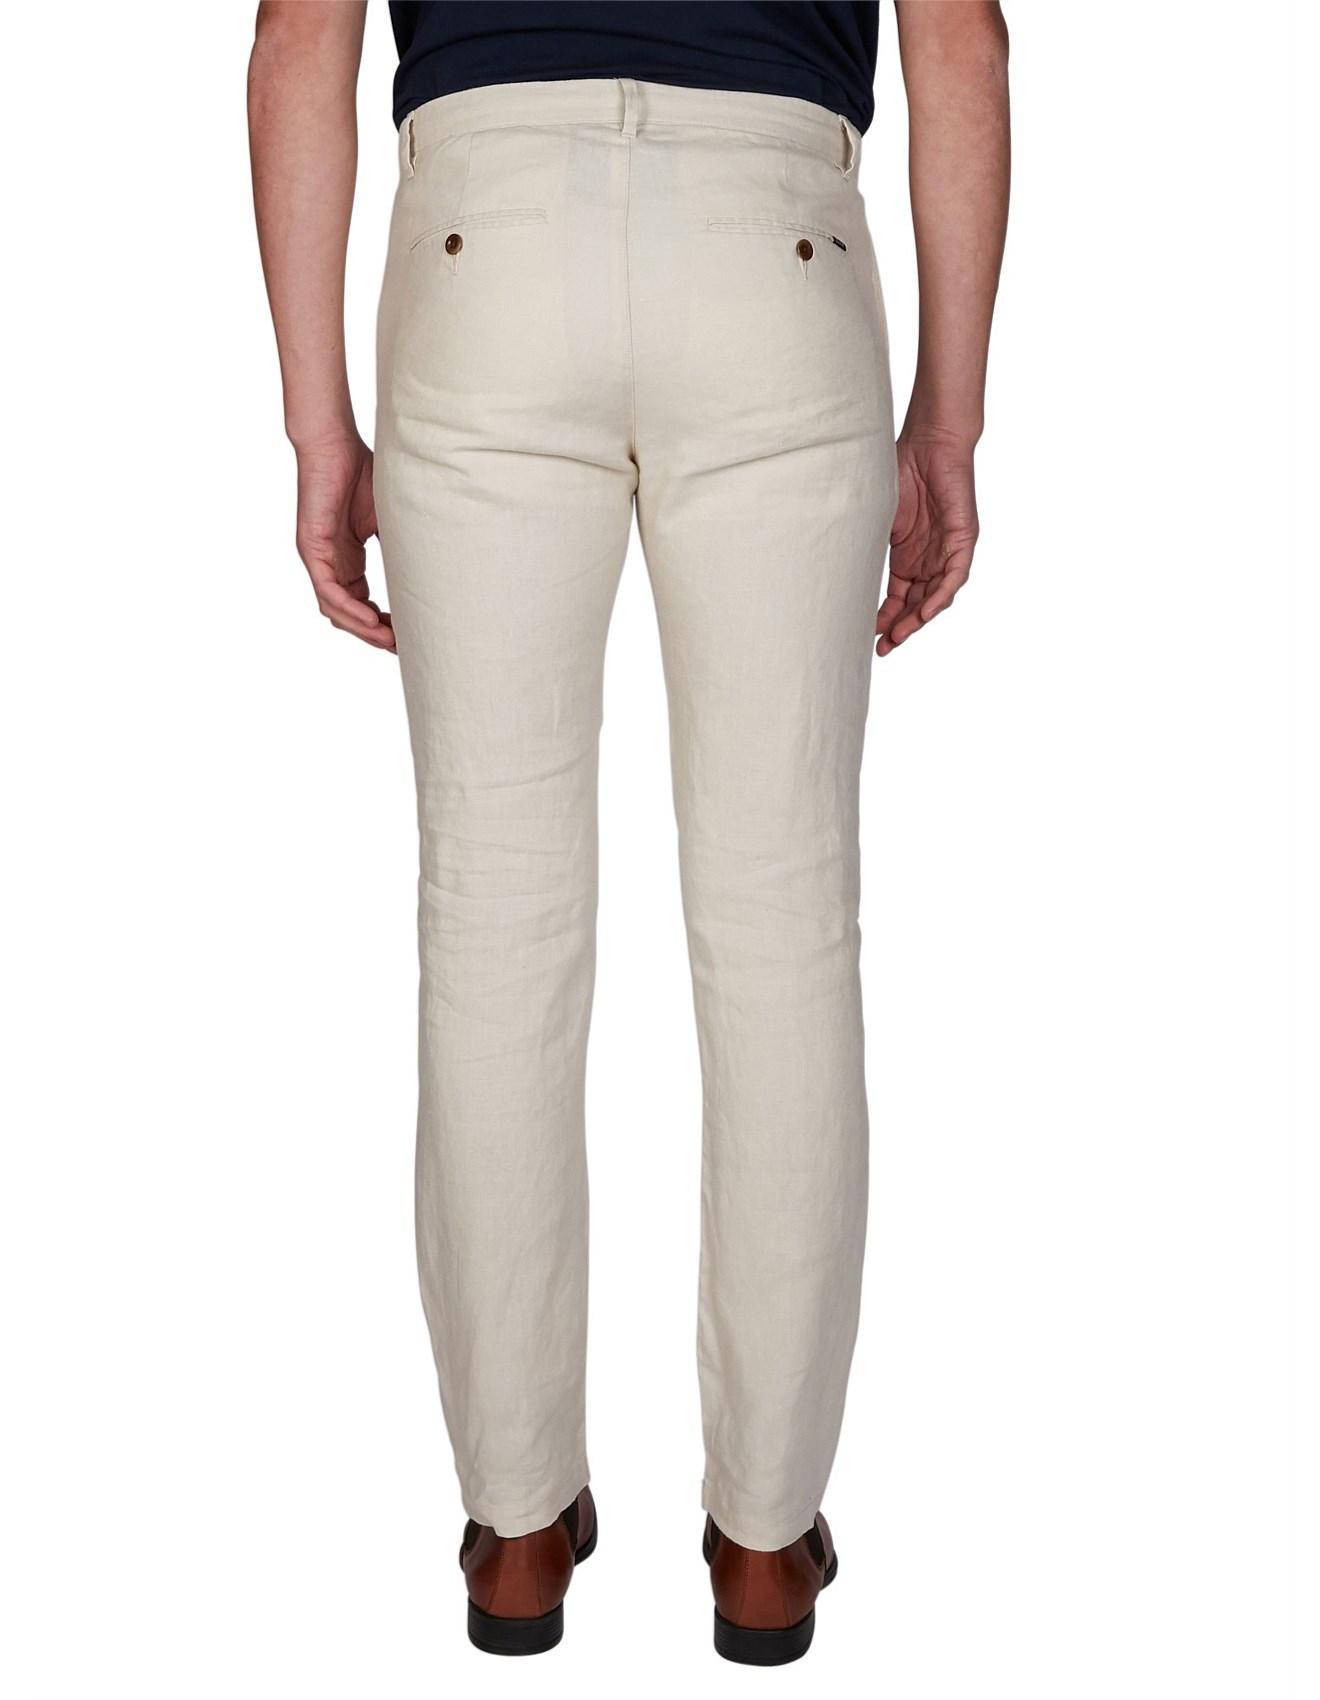 Gant Shorts Gant Men/'s Relaxed Linen Shorts Putty